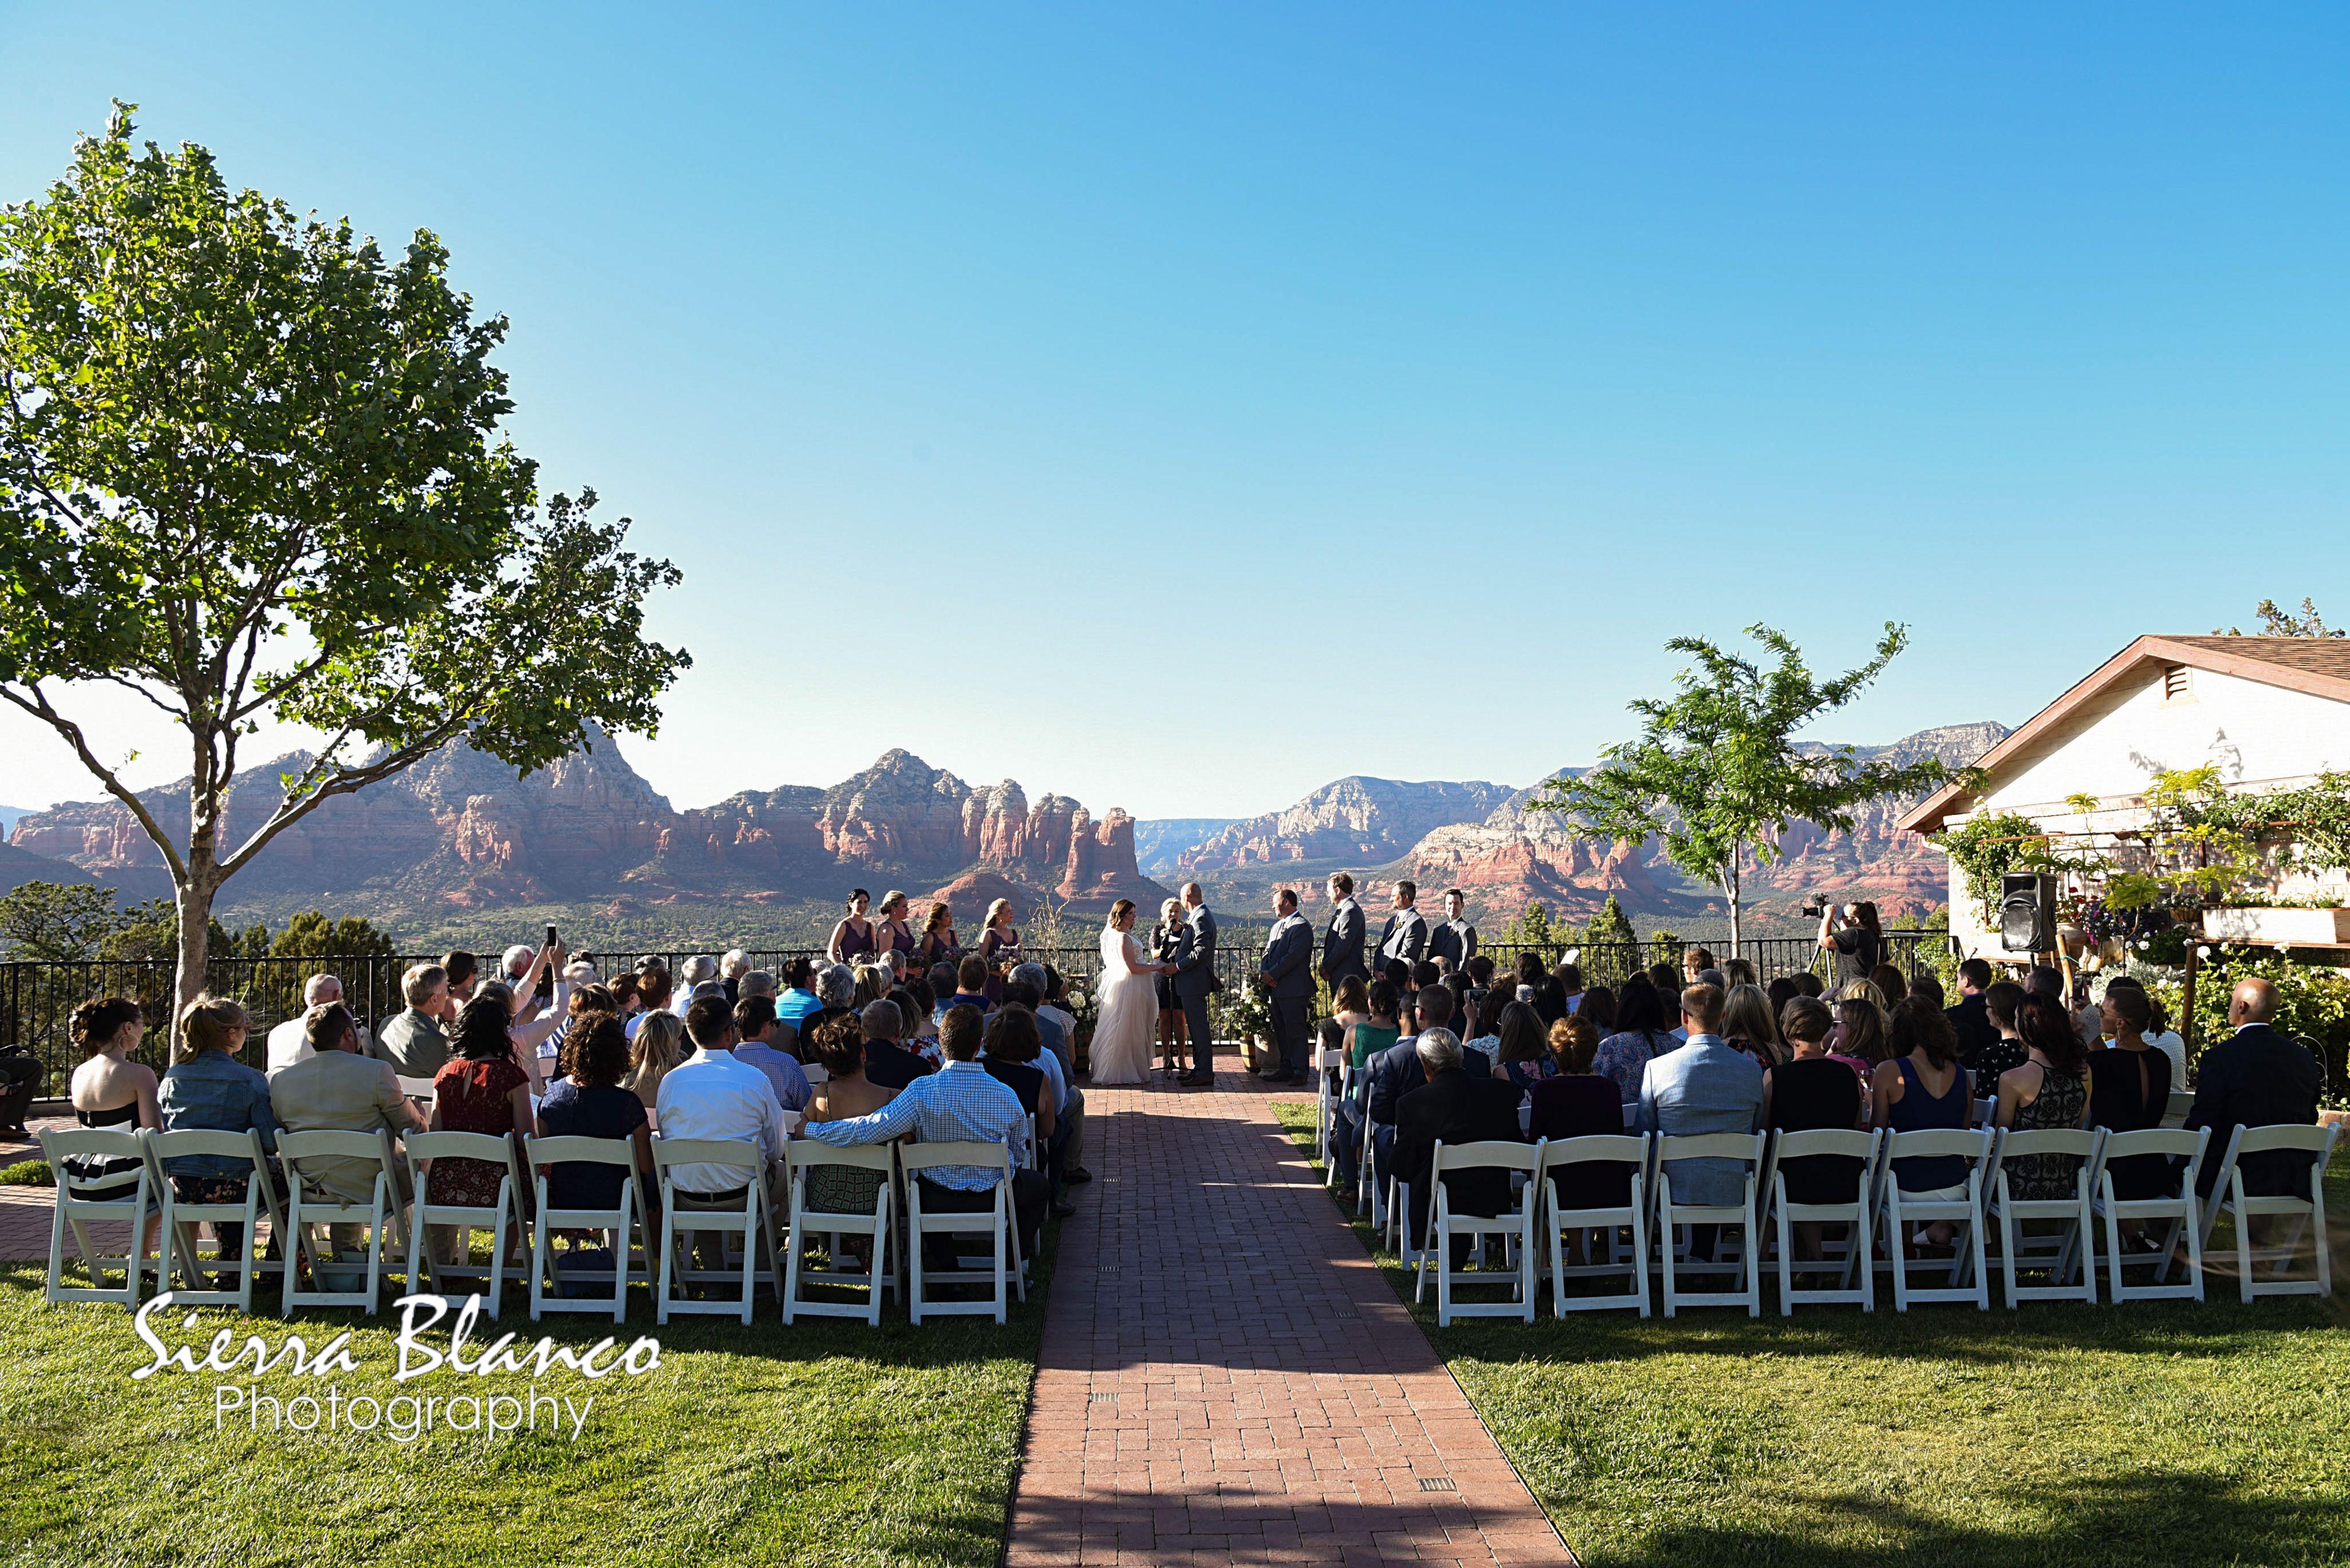 Pc Sierra Blanco Photography Venue Sky Ranch Lodge In Sedona Az Arizona Wedding Wedding Ceremony Sites Wedding Coordinator